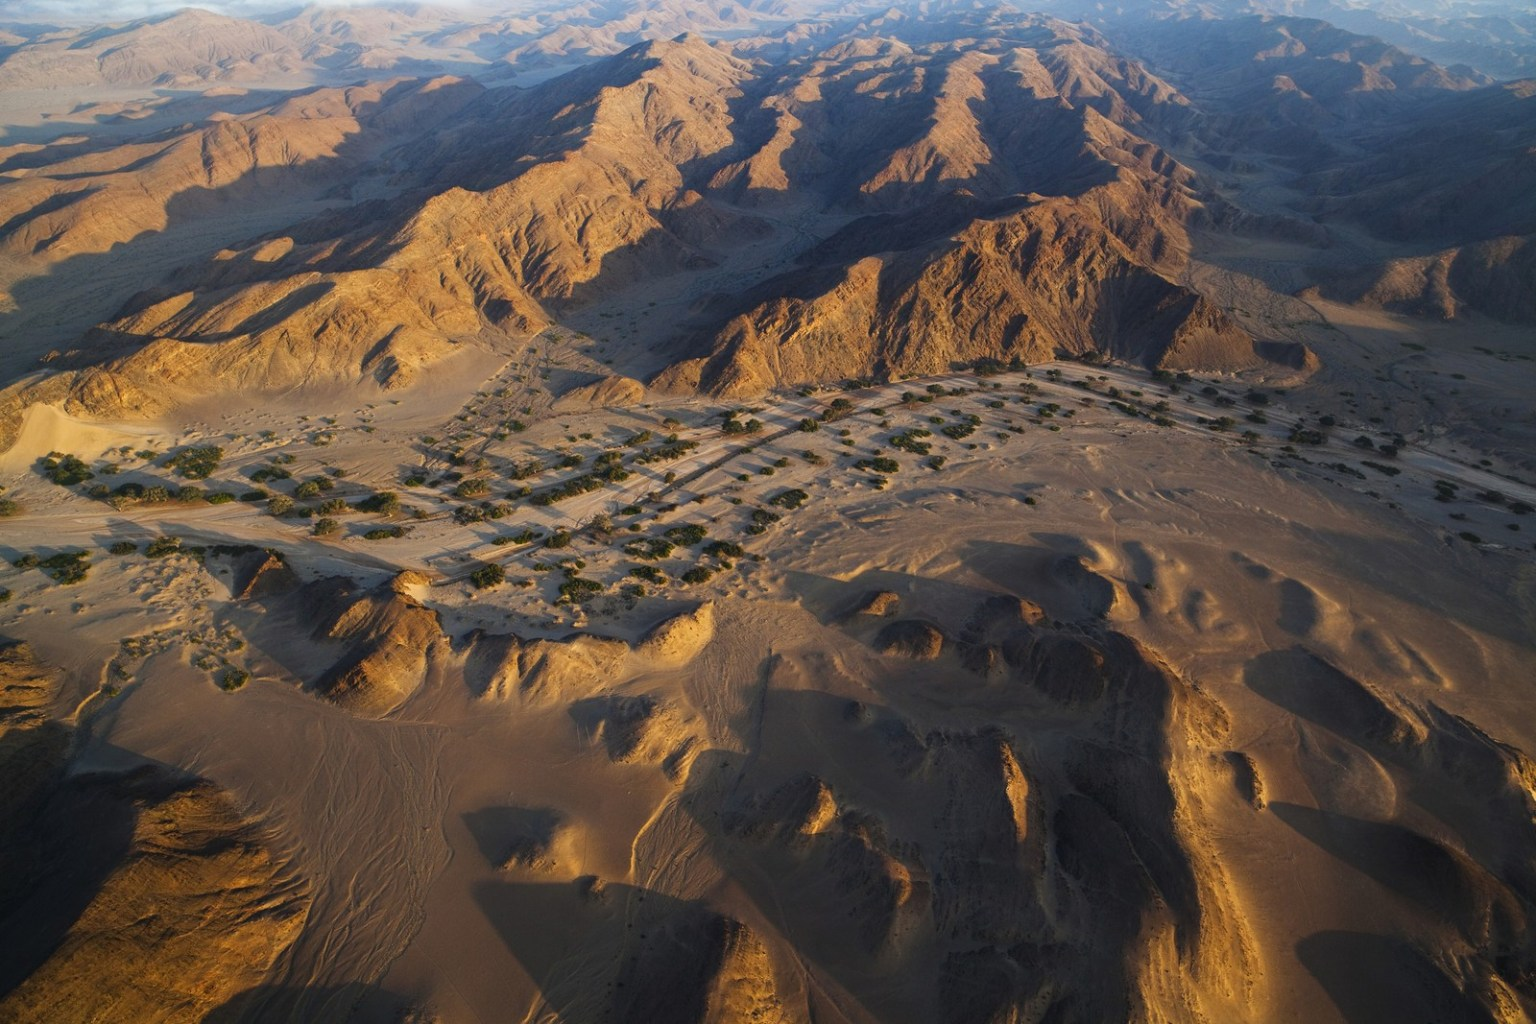 Image: Namibia; Namib Desert, Skeleton Coast, aerial view of Hoanib River valley, habitat for desert elephants